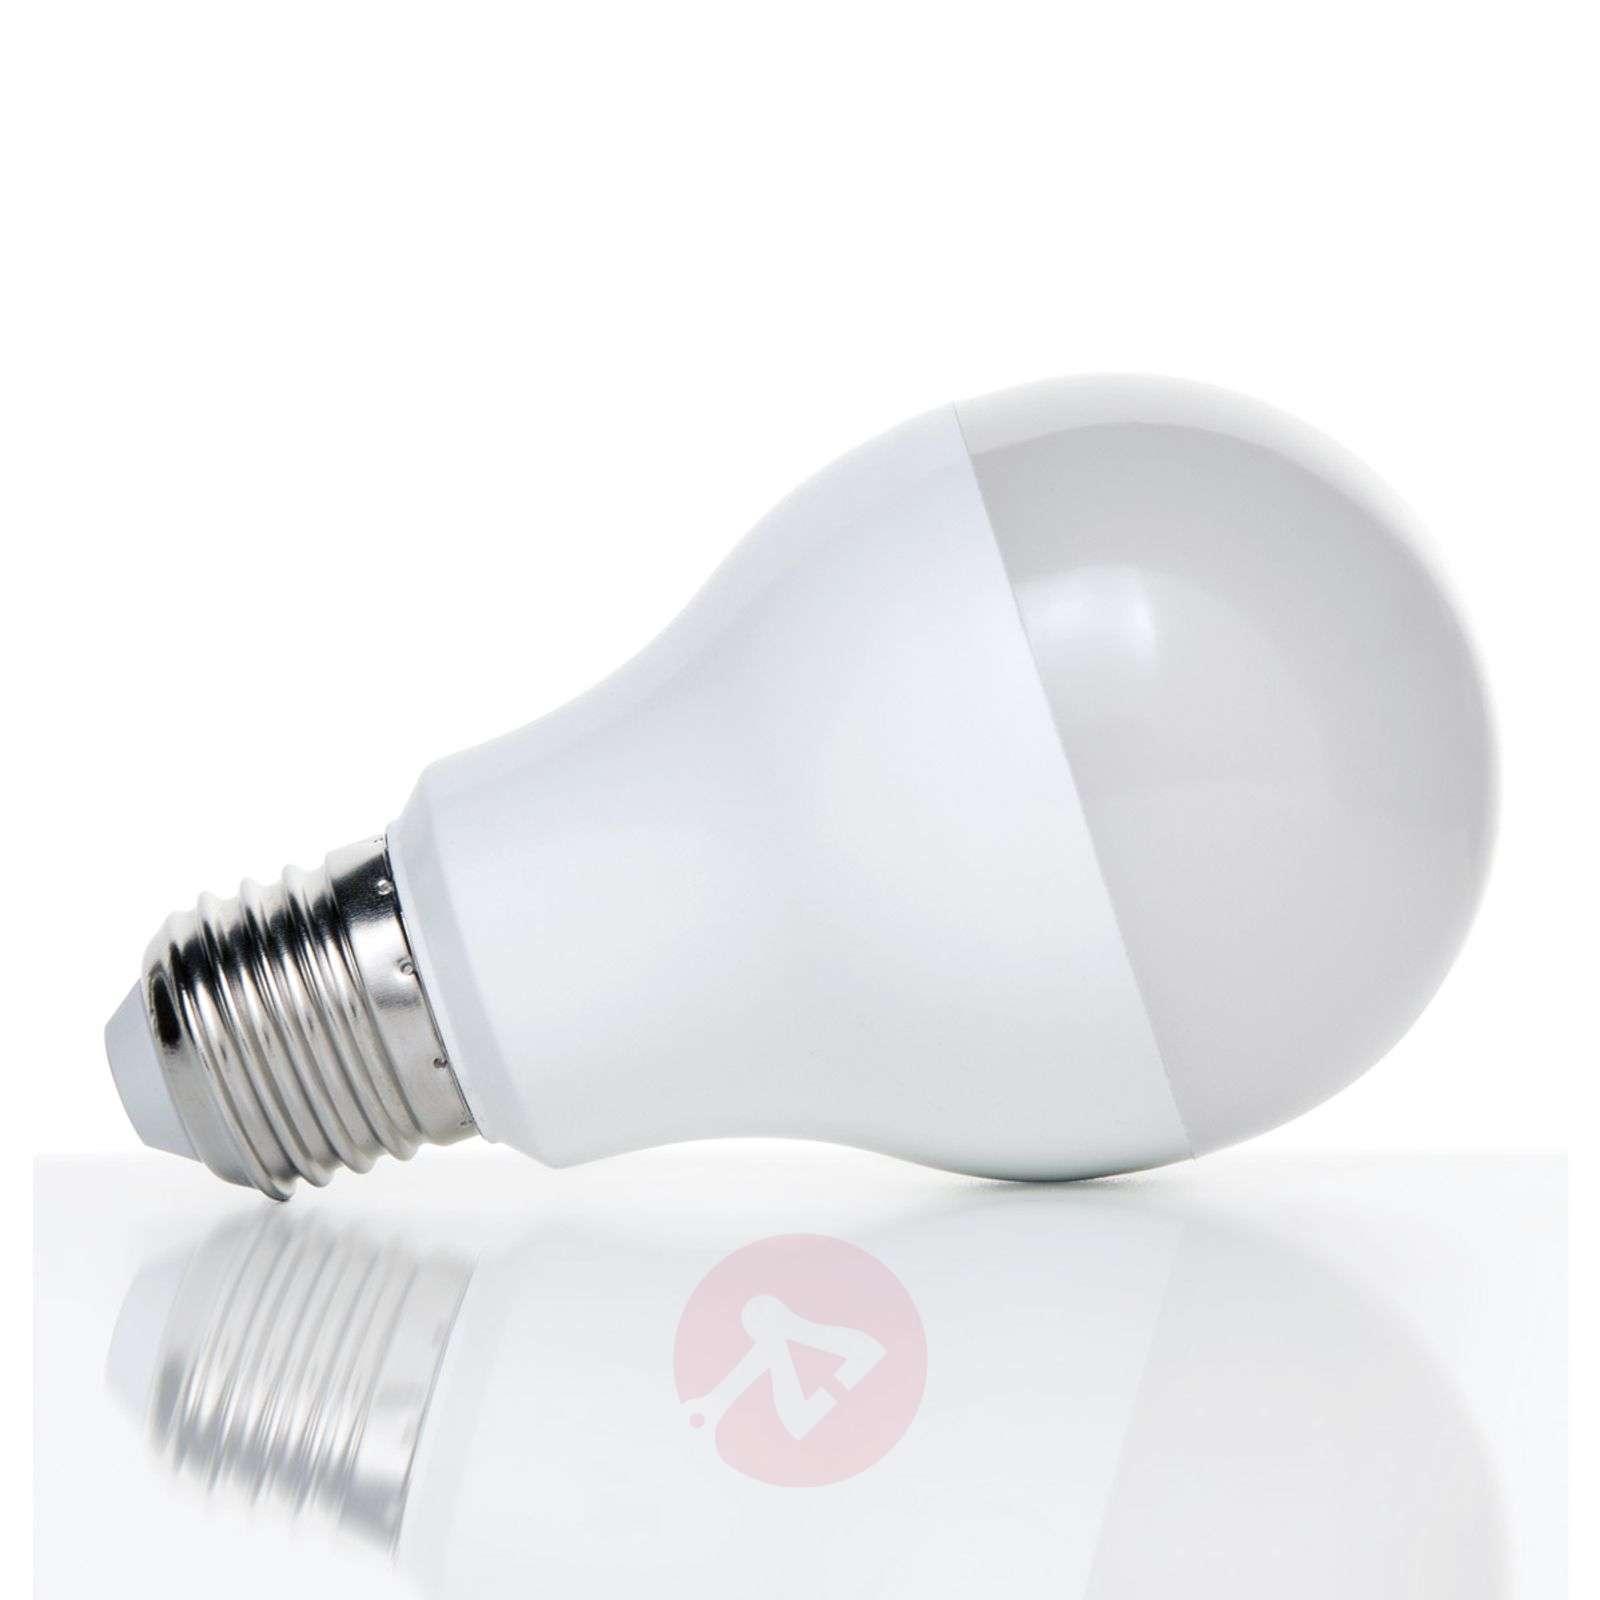 E27 15W 827 LED light bulb, opal-7255110-02